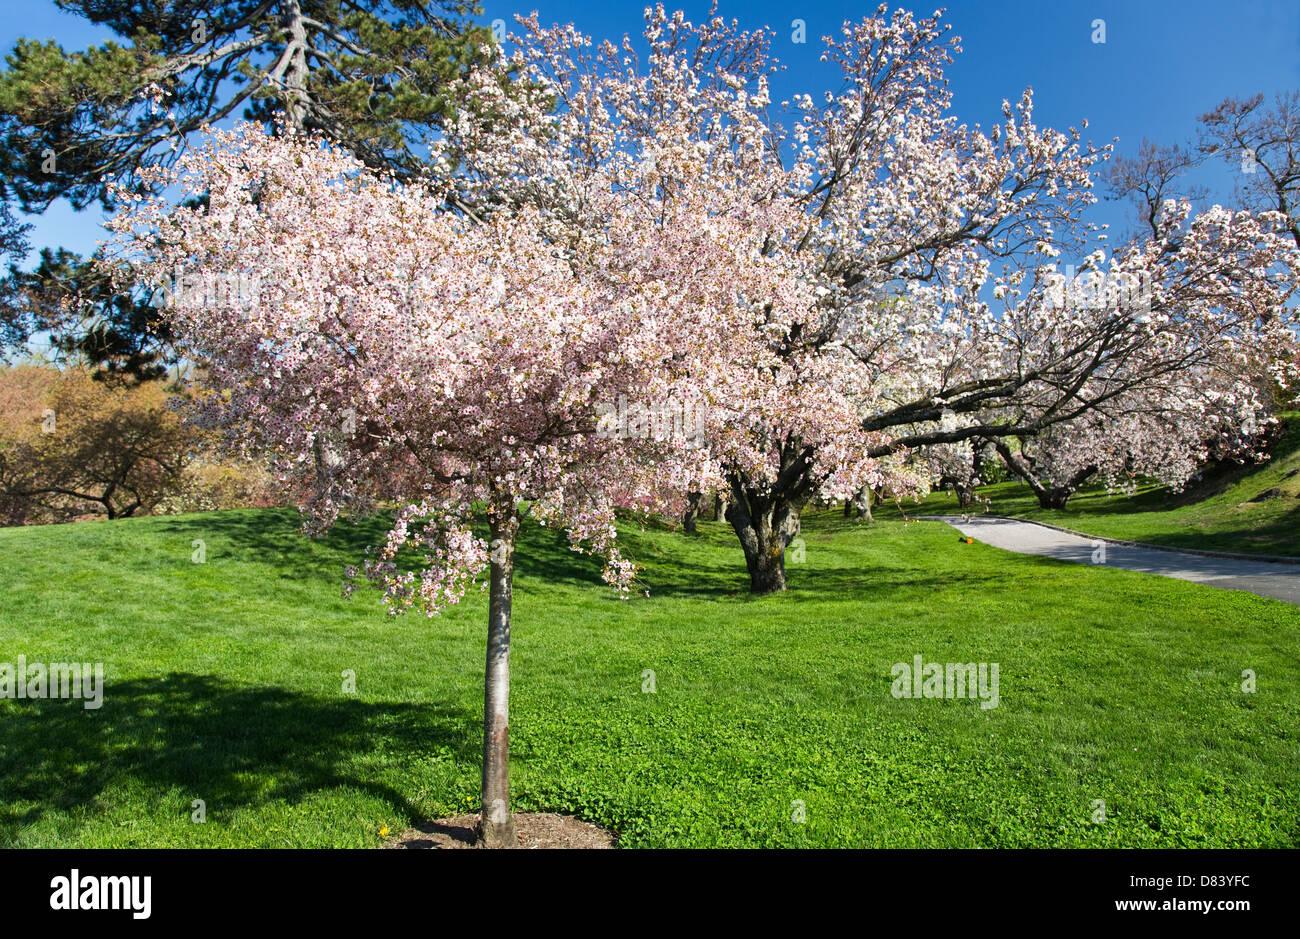 Oriental Cherry Tree Stock Photos & Oriental Cherry Tree Stock ...